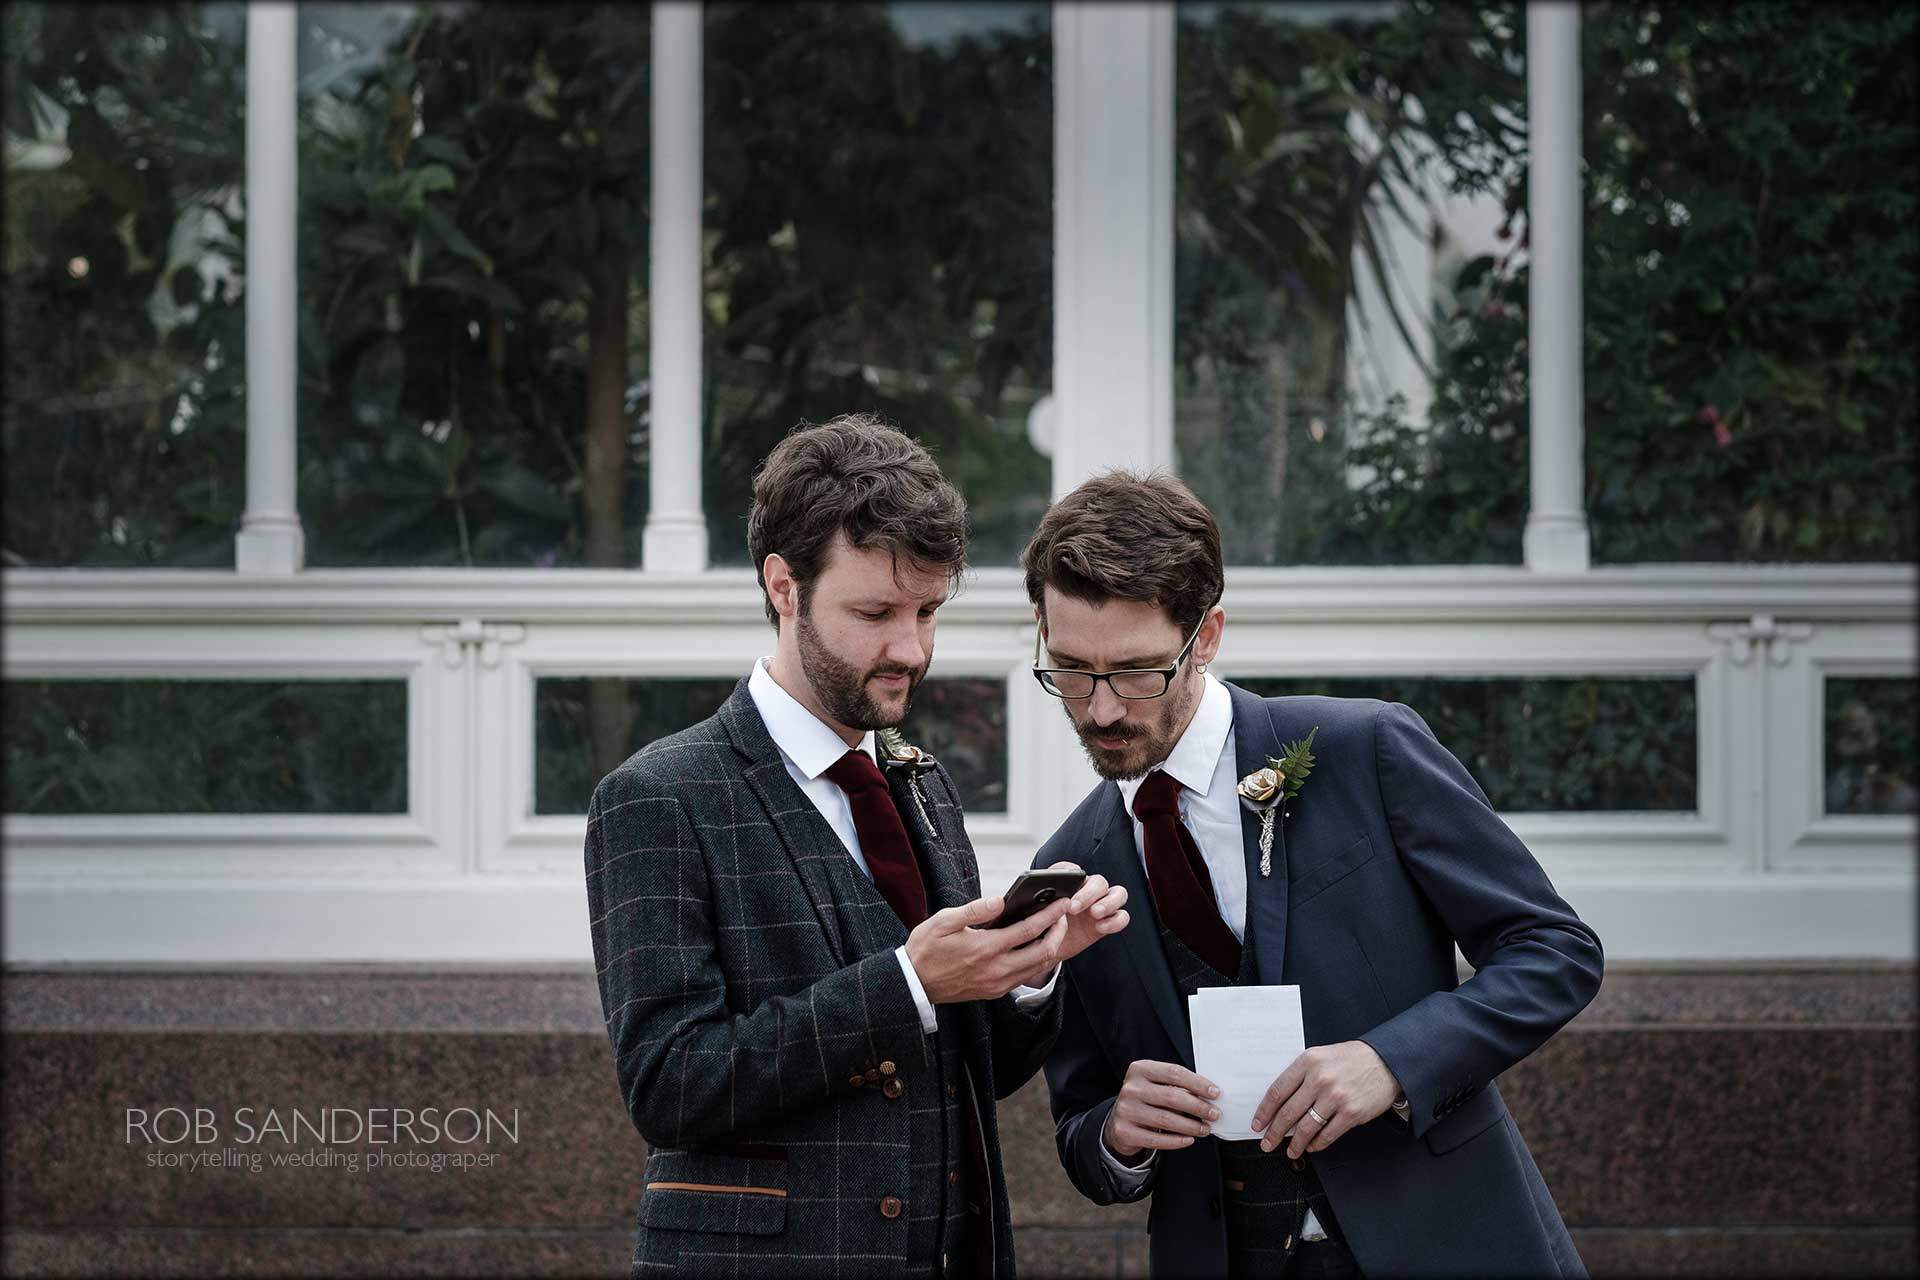 Groom chats to his groomsman